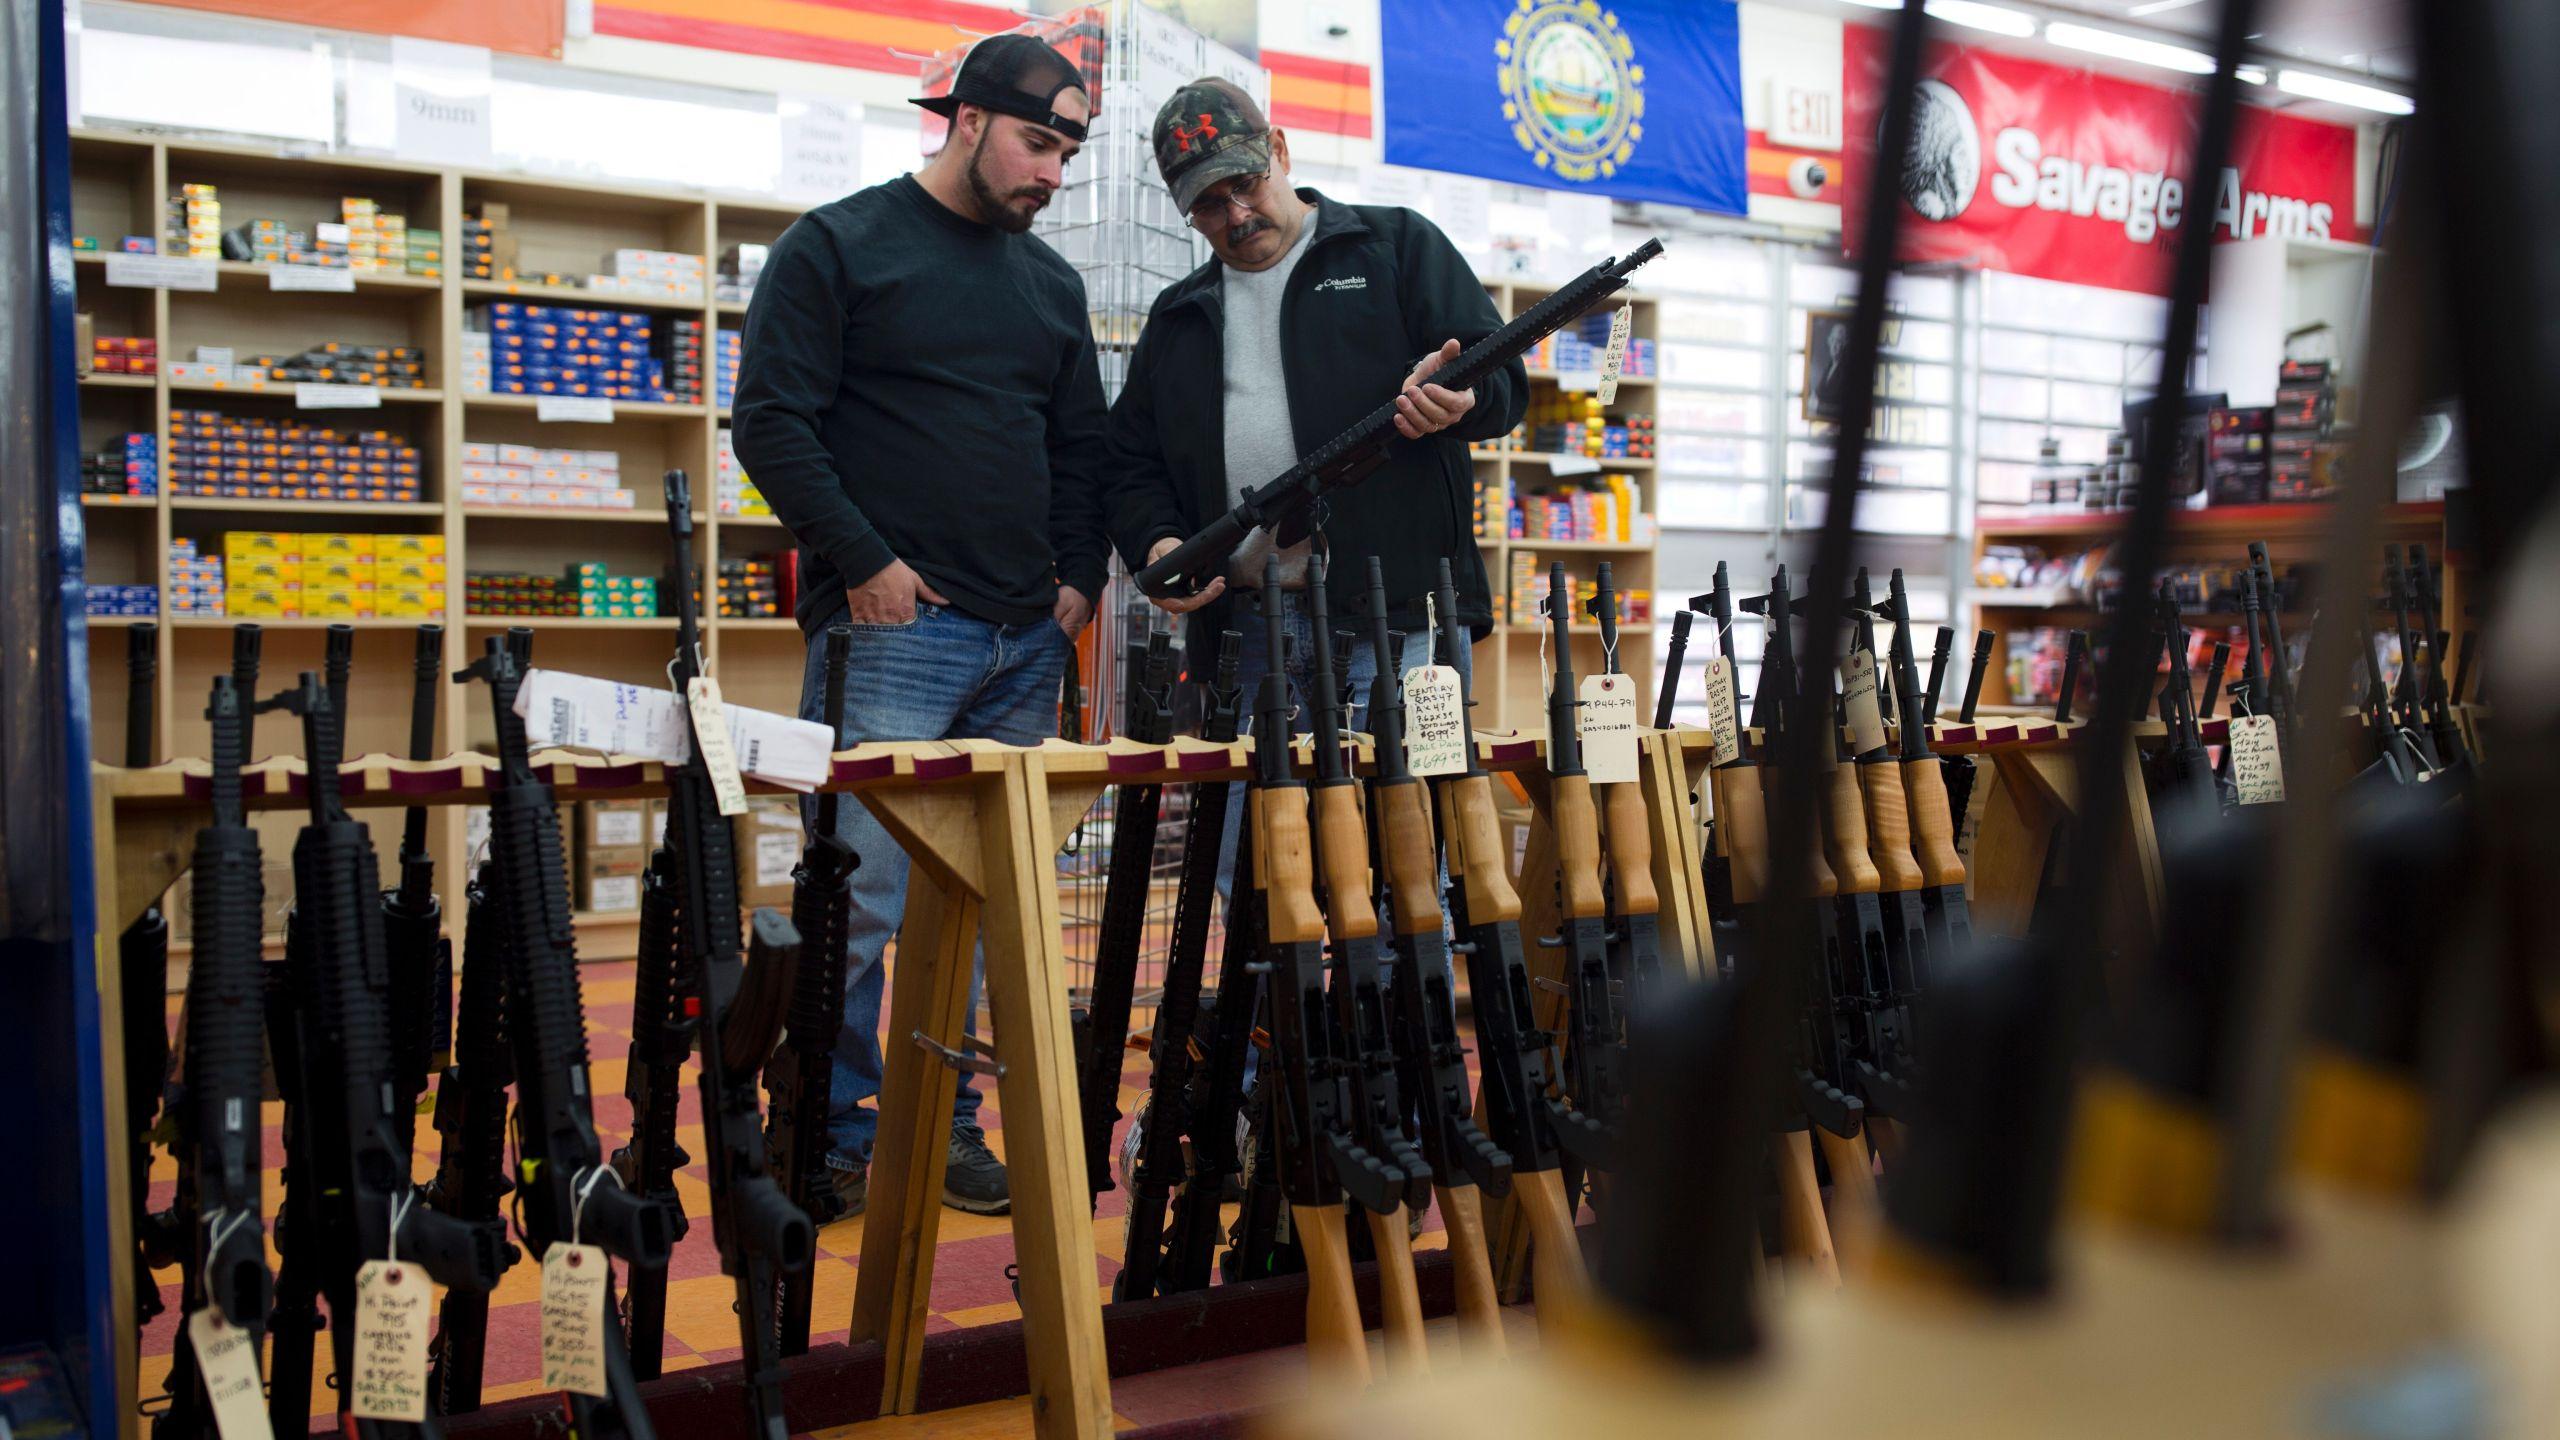 Customers look at a long gun at a gun shop on Nov. 5, 2016, in Merrimack, New Hamp. (Credit: DOMINICK REUTER/AFP/Getty Images)